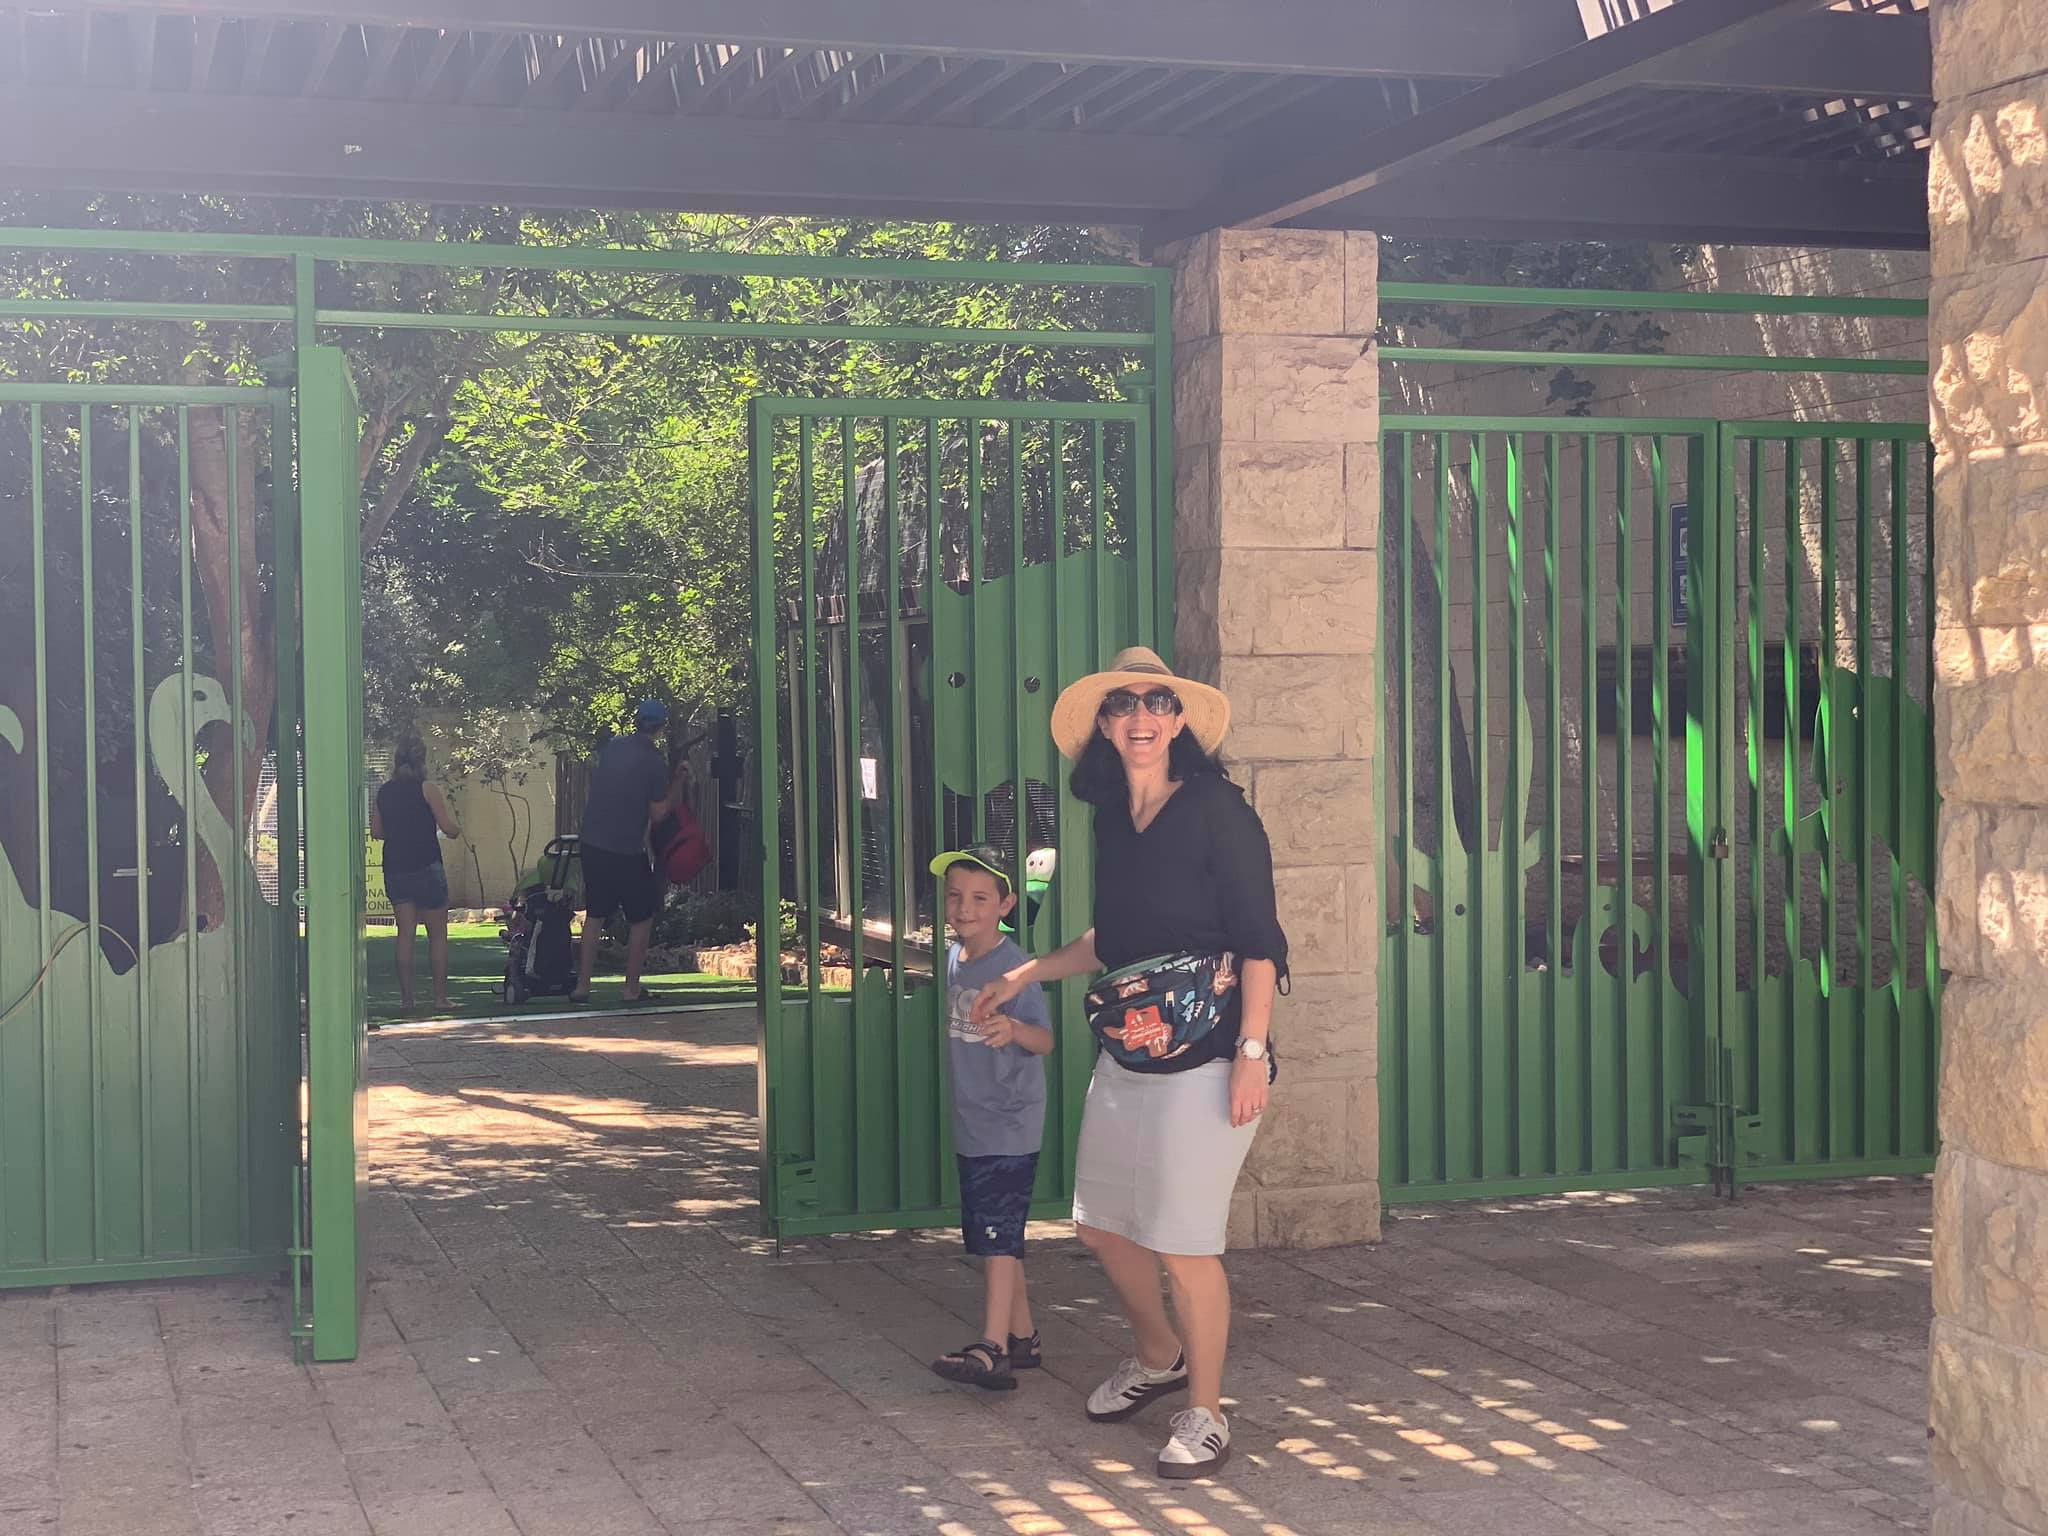 Destination: Haifa Educational Zoo